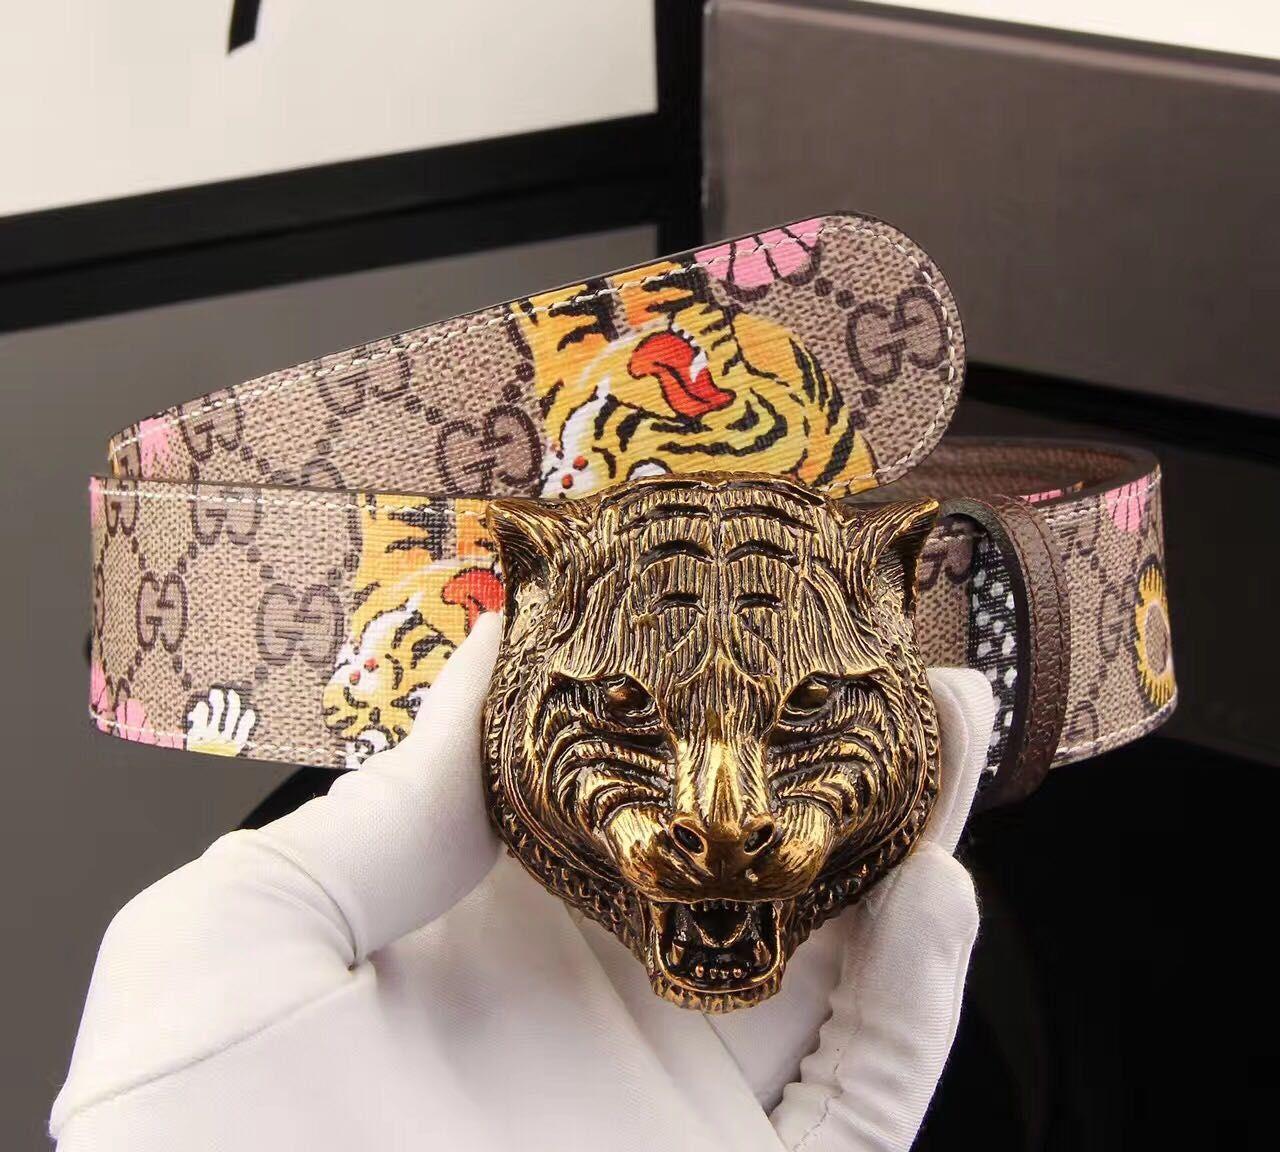 f7cefcec63a 2018 New Fashion Brand Designer Belt Tiger Buckle Luxury Men S High Quality  Belt